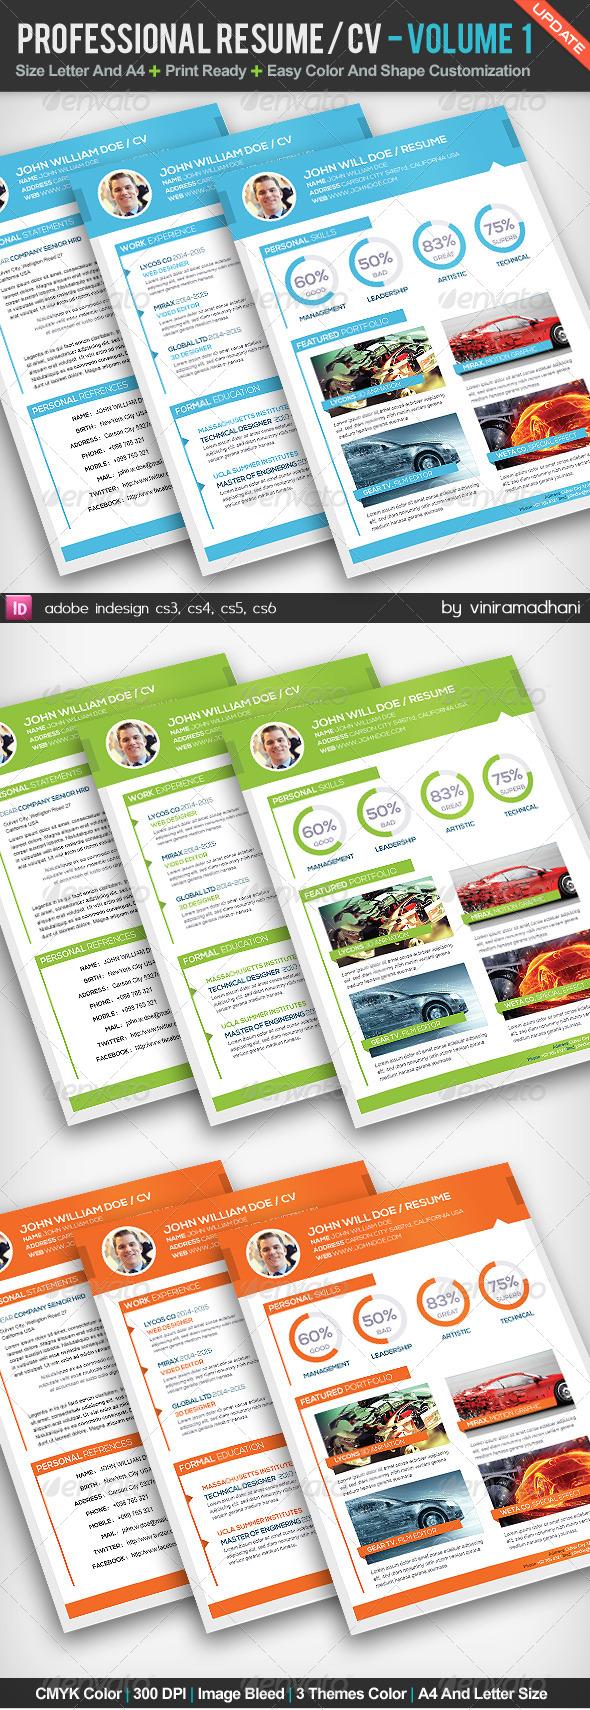 GraphicRiver Professional Resume CV Volume 1 5182283